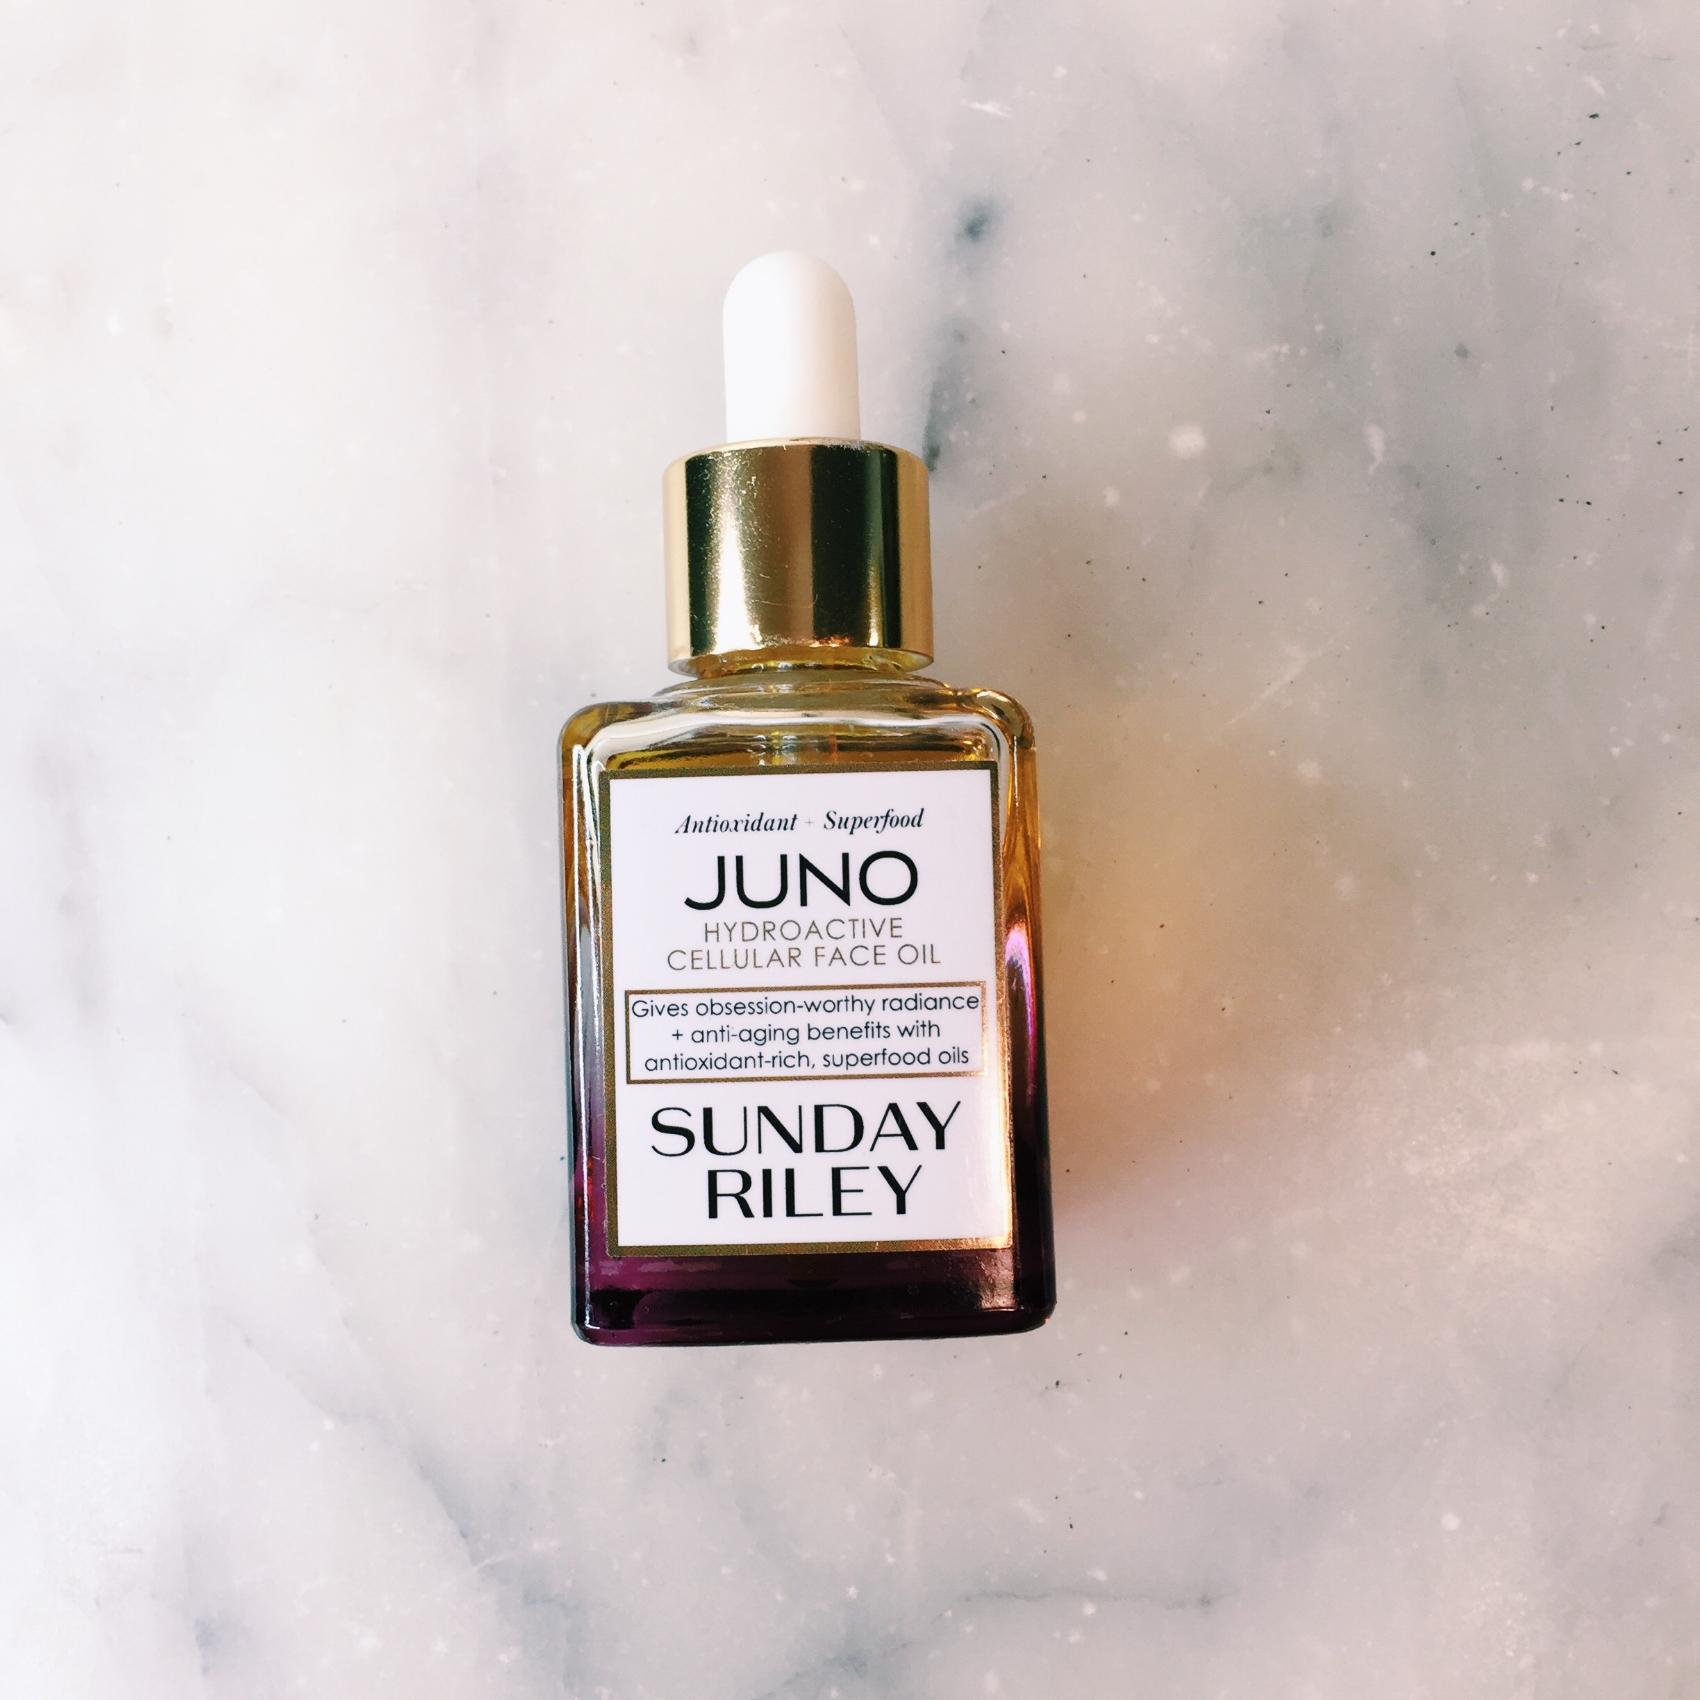 Sunday Riley Juno Cellular Face Oil